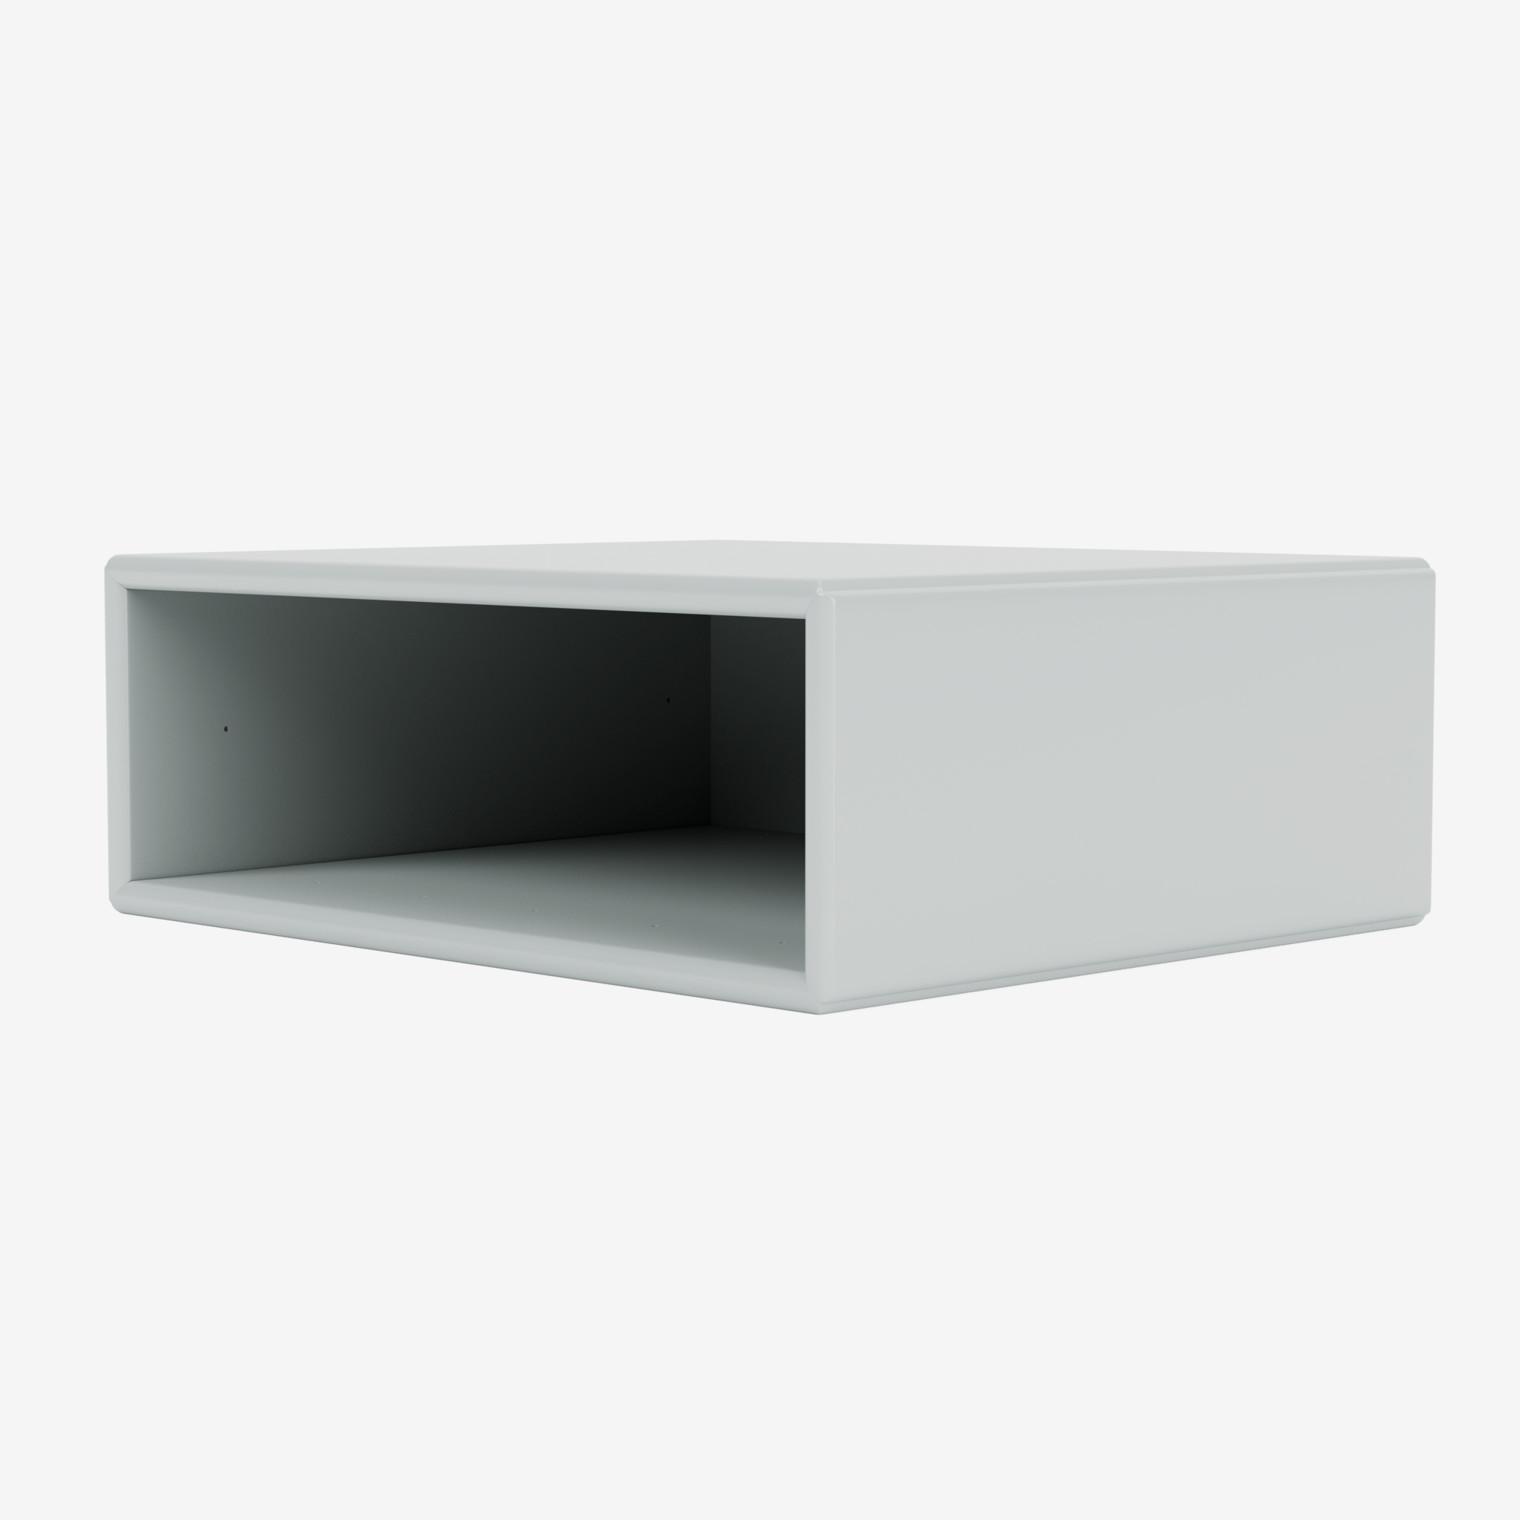 Bedside table 8161